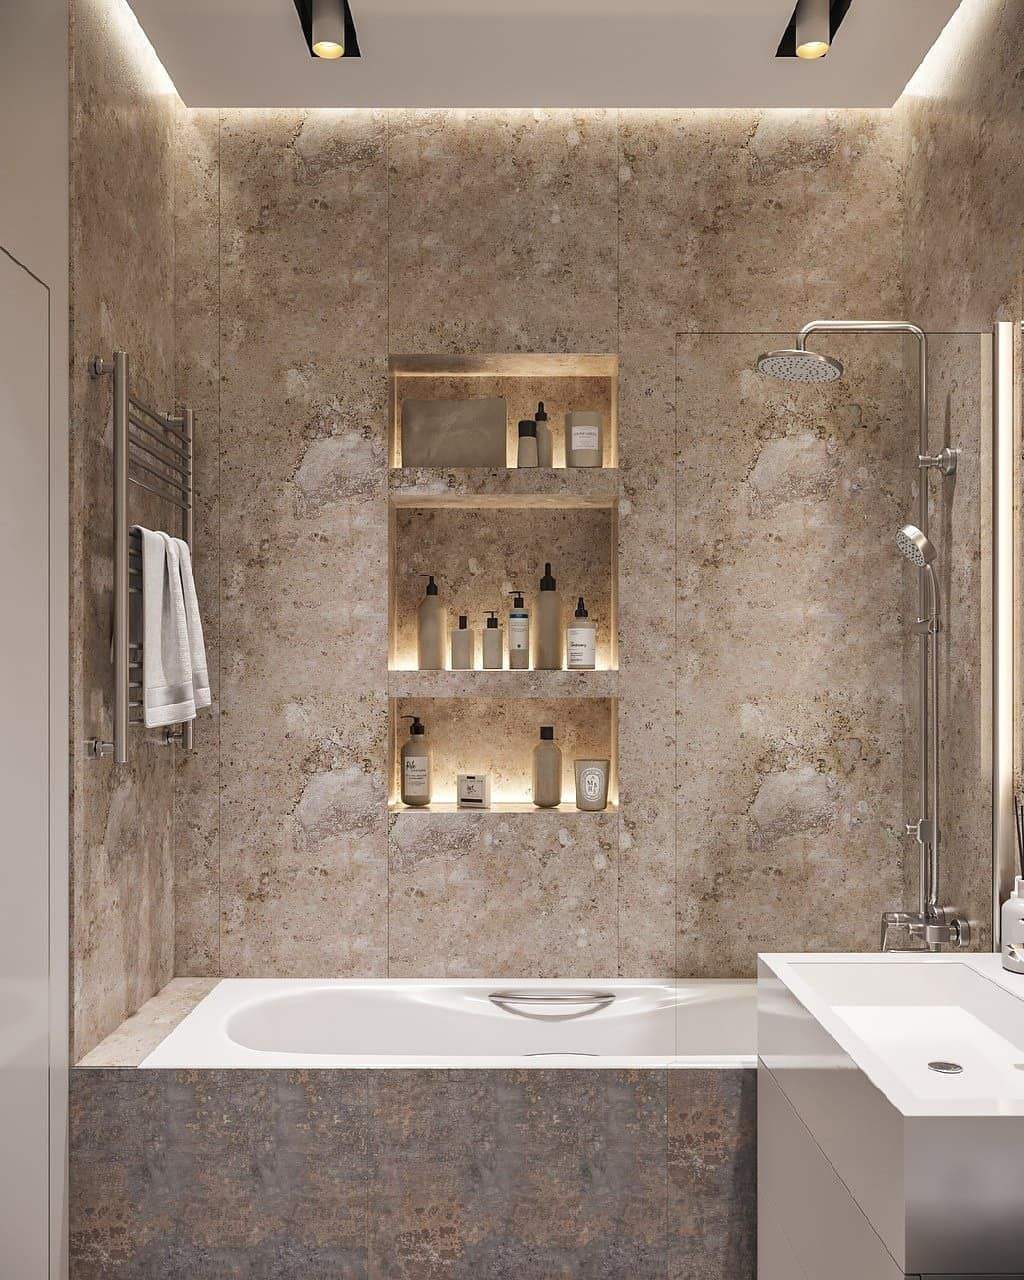 25 Minimalist Small Bathroom Ideas Feel The Big Space Pandriva Bathroom Design Small Small Space Bathroom Design Small Bathroom